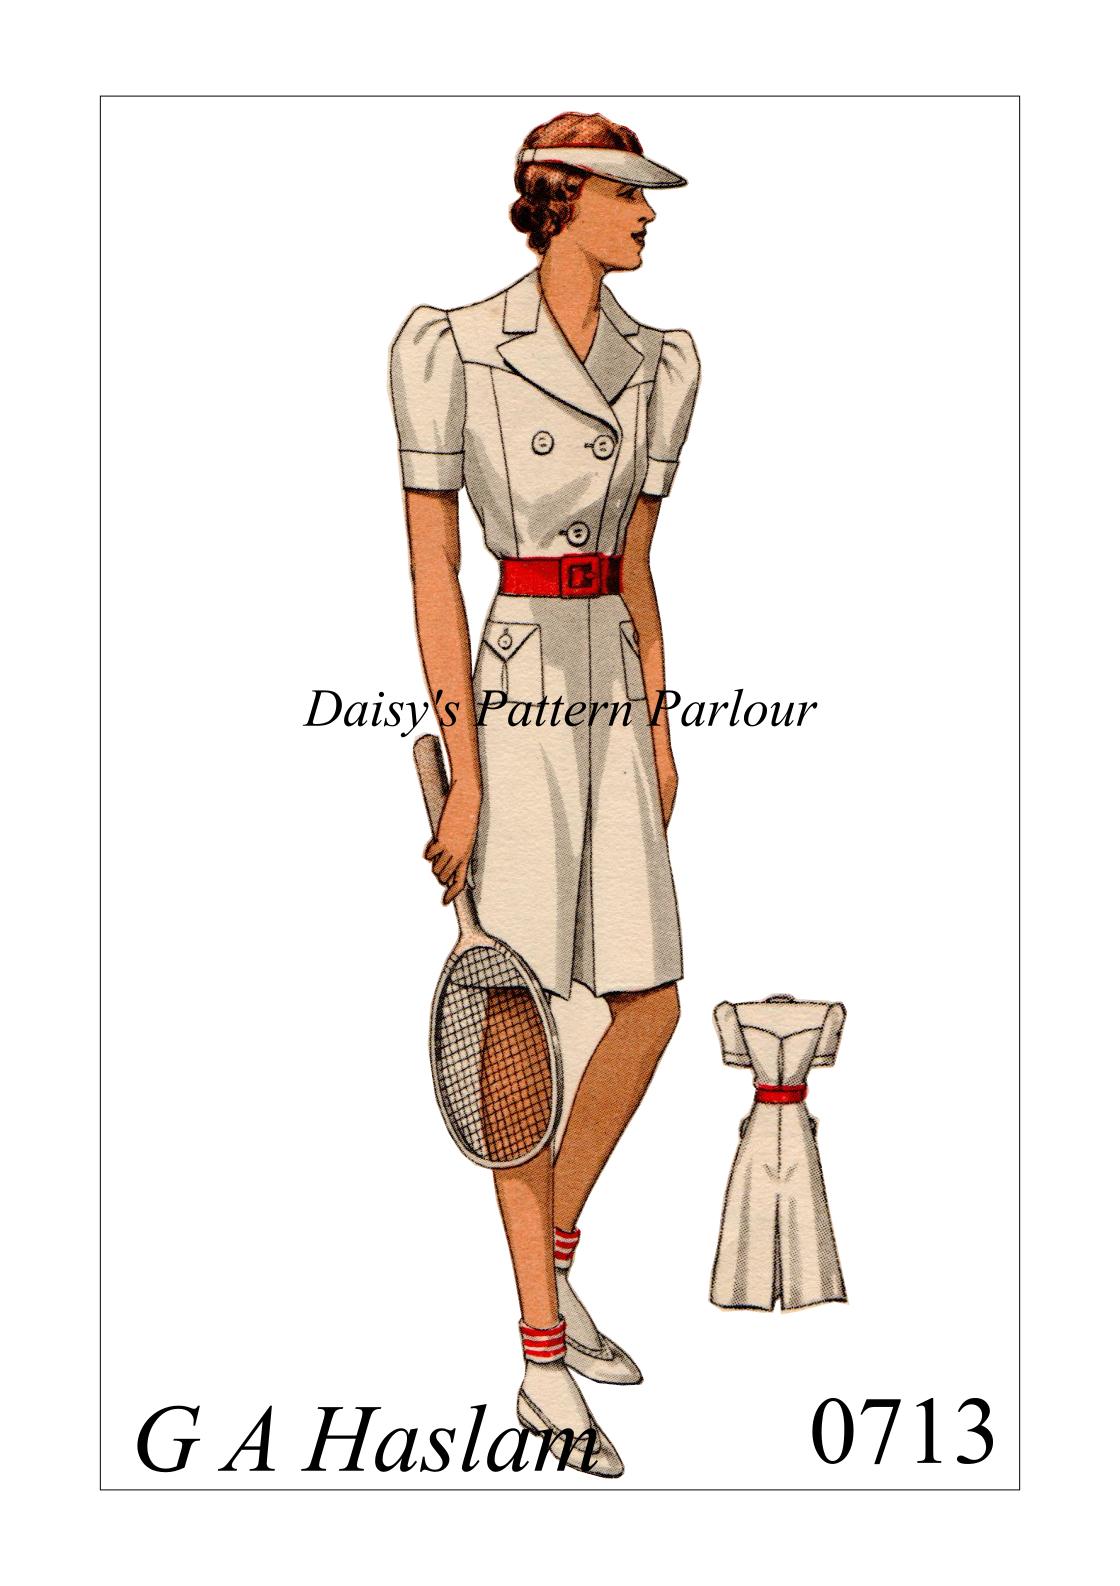 1930s tennis ensemble vintage sewing pattern. High quality multi ...